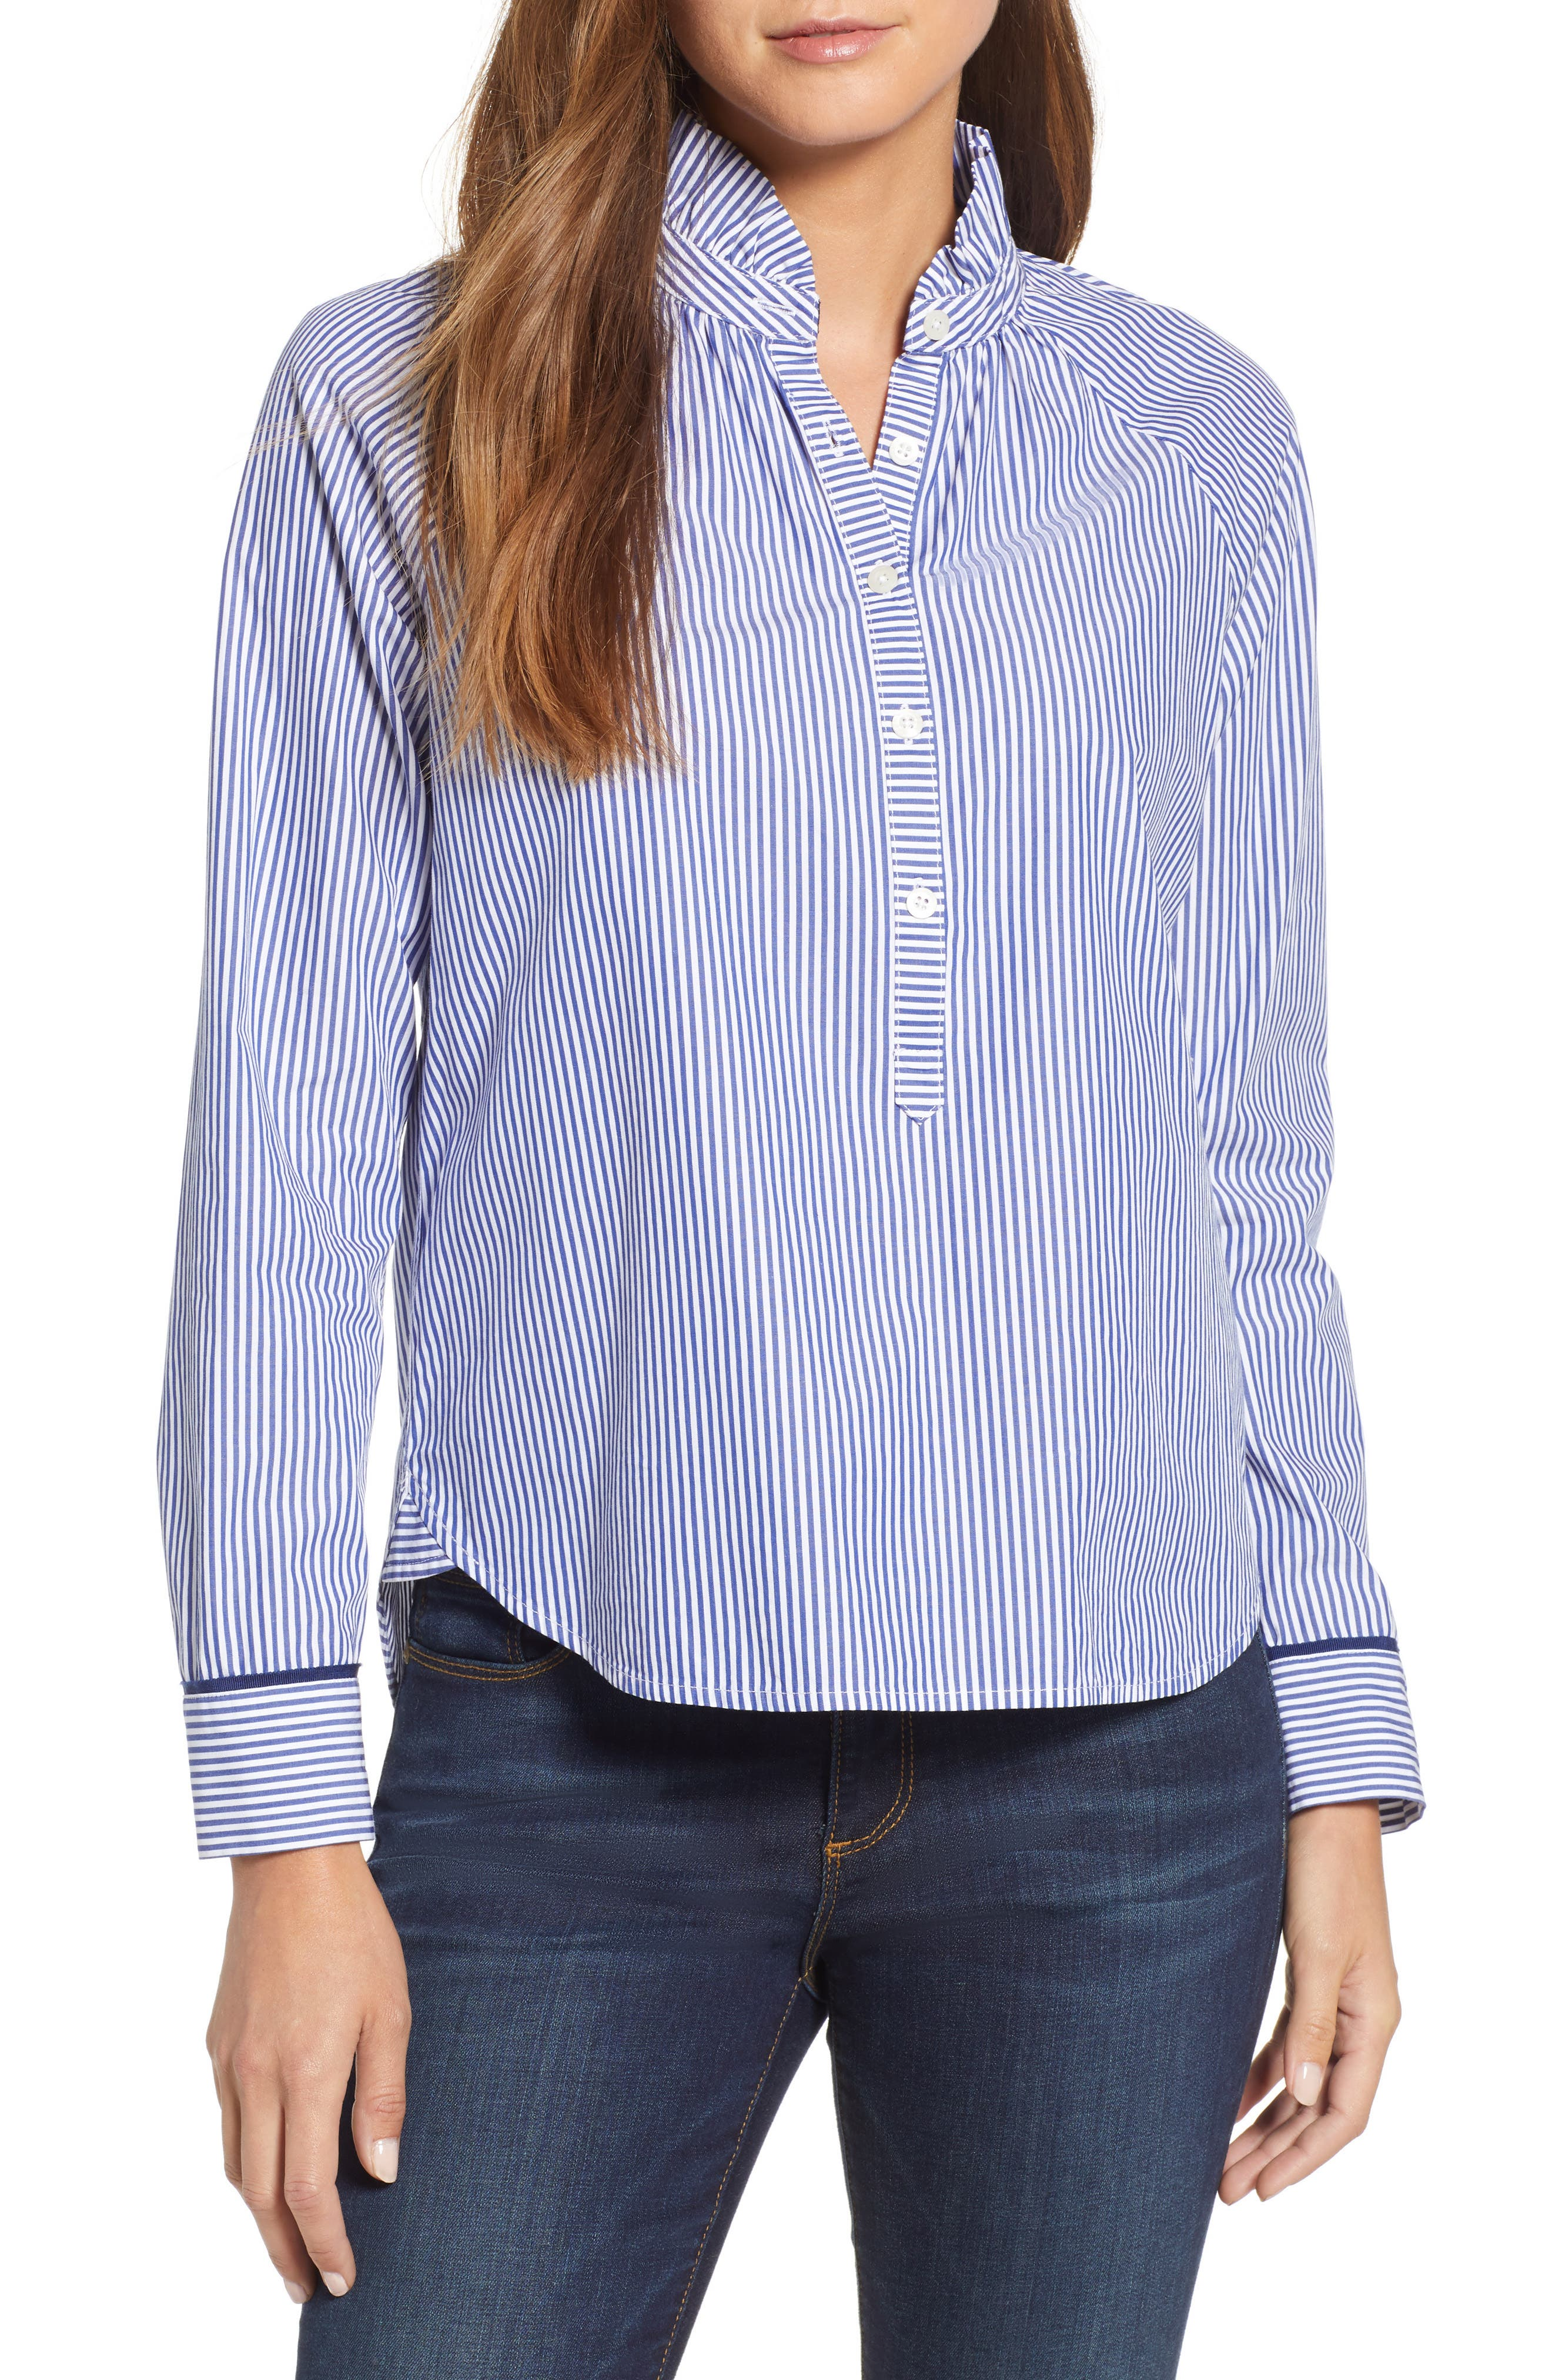 VINEYARD VINES,                             Stripe Ruffle Shirt,                             Main thumbnail 1, color,                             474